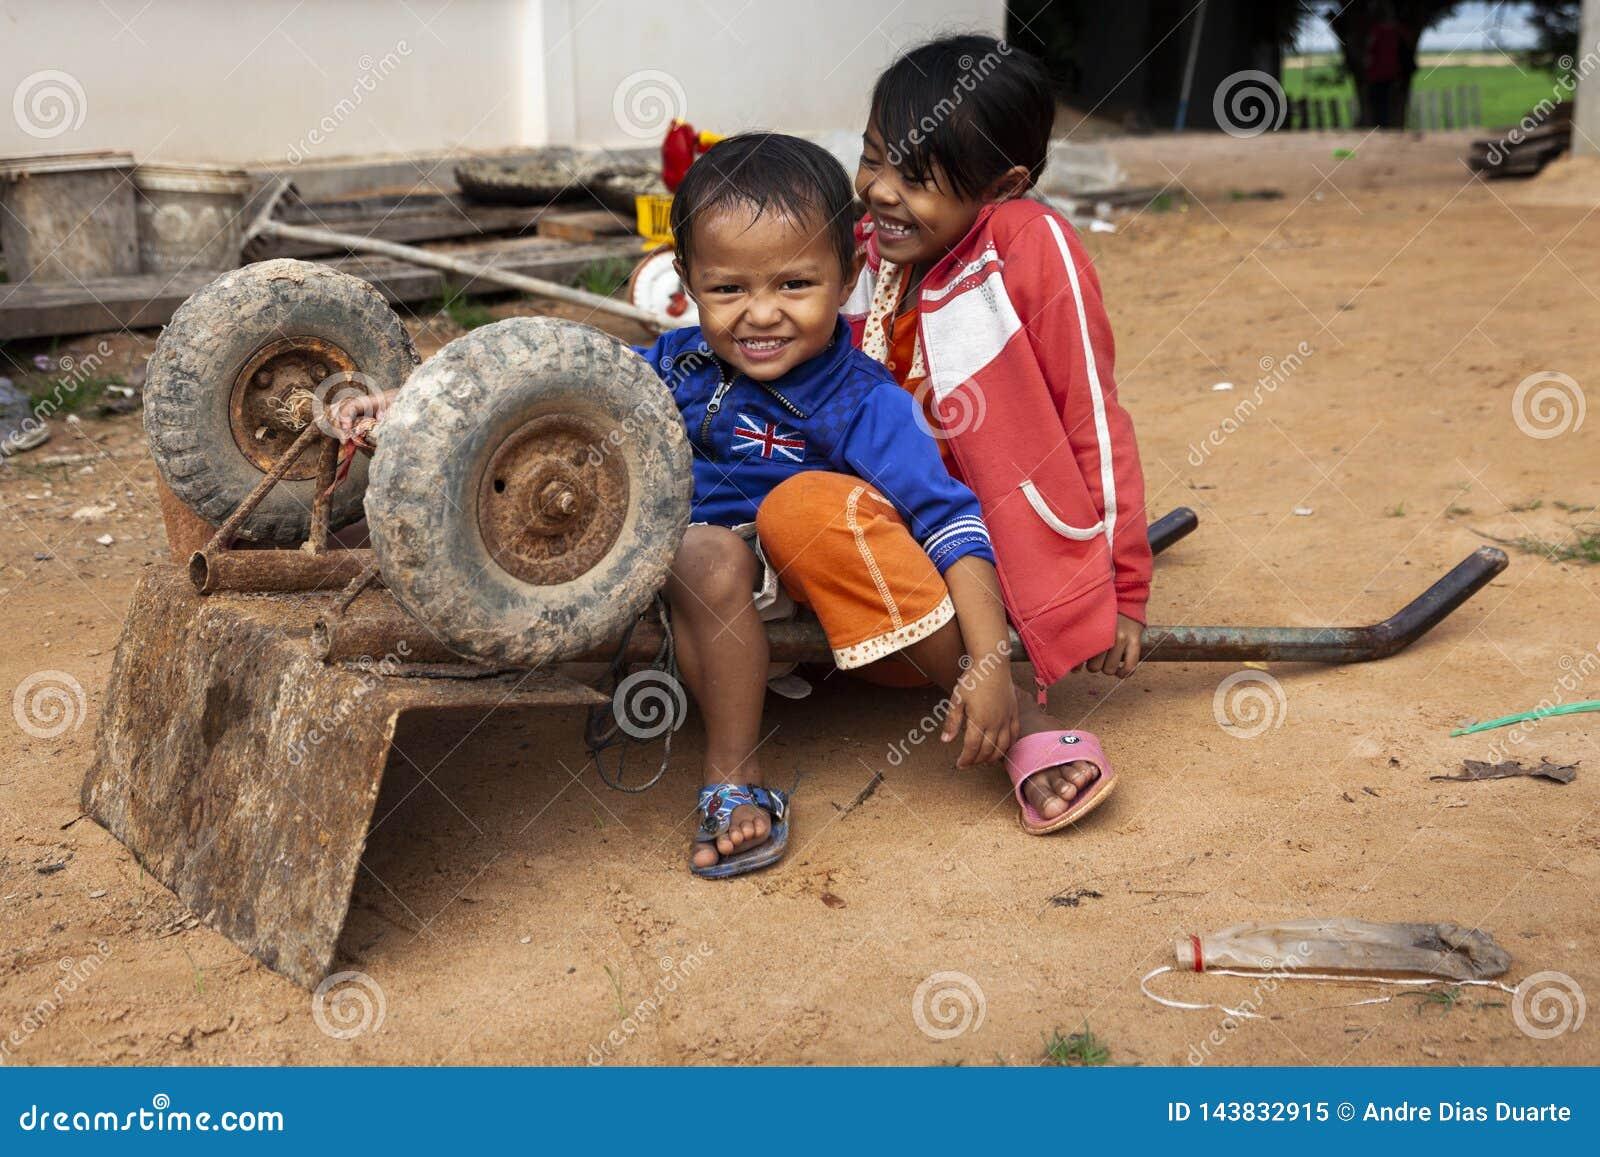 Two kids playing with a wheelbarrow